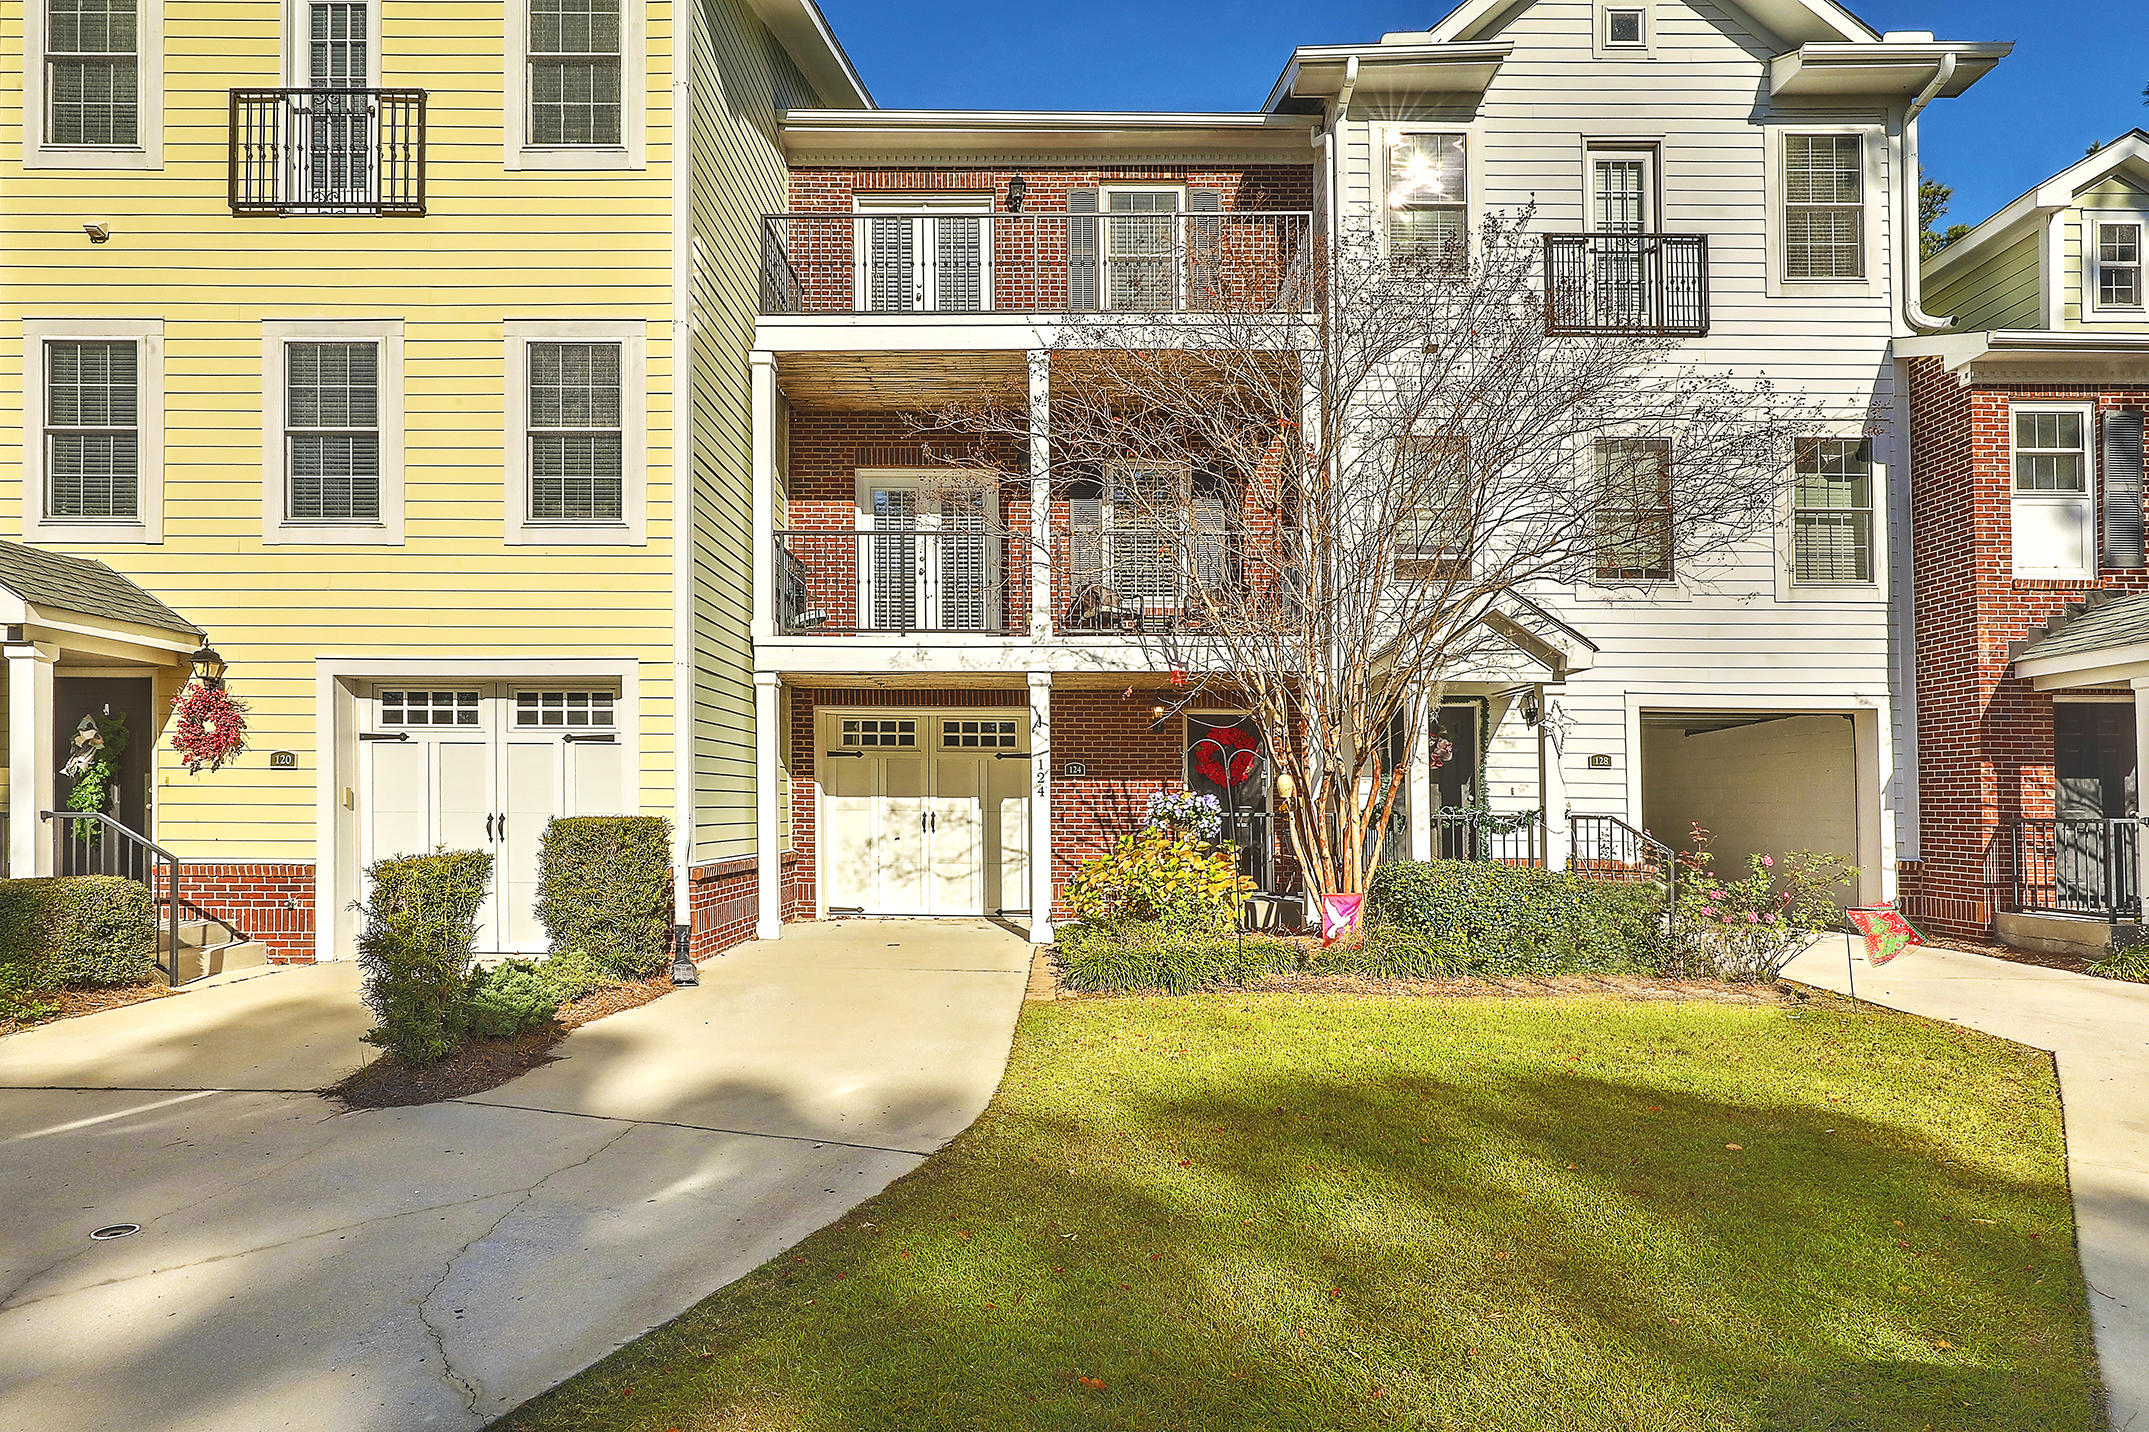 Etiwan Pointe Homes For Sale - 124 Winding Creek, Mount Pleasant, SC - 7